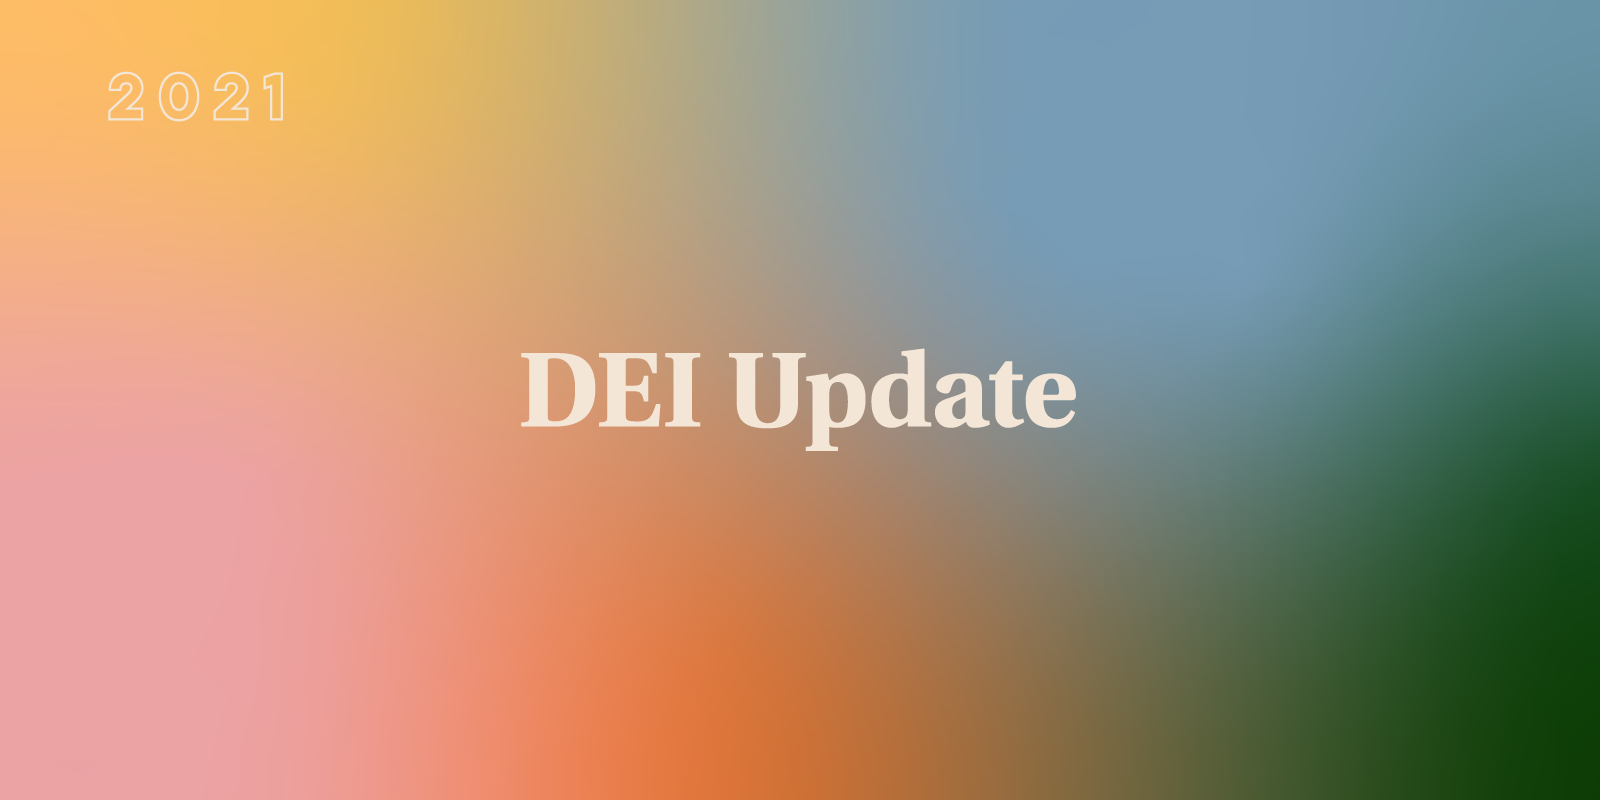 DEI Update